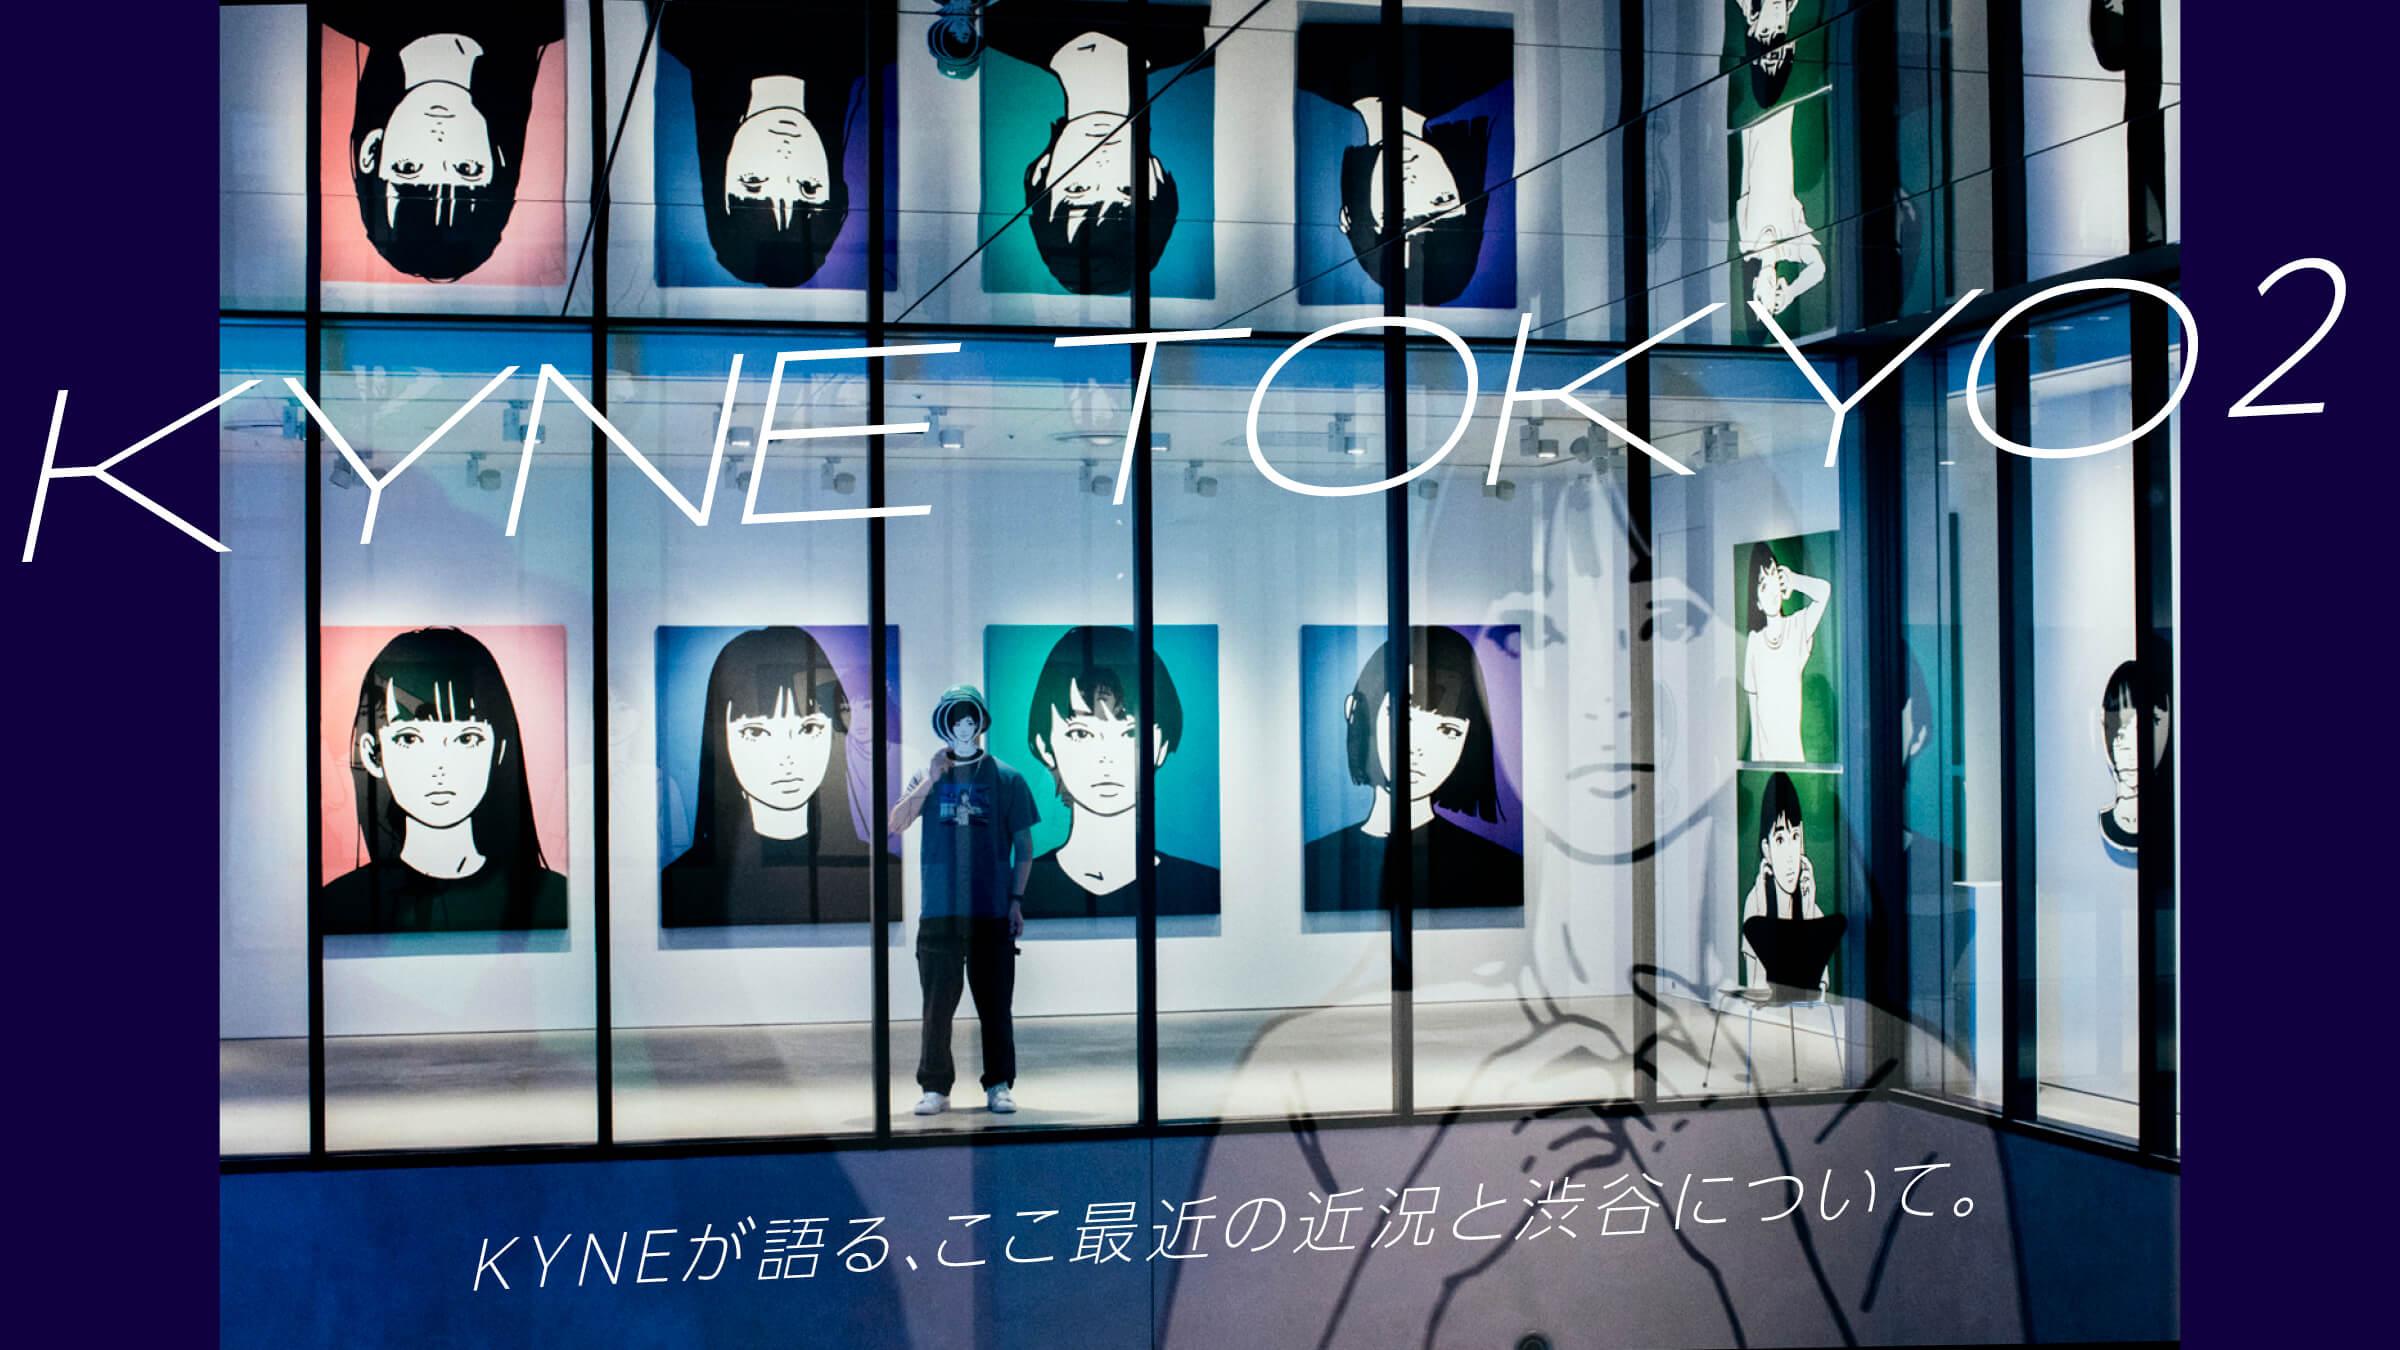 KYNEが語る、ここ最近の近況と渋谷について。